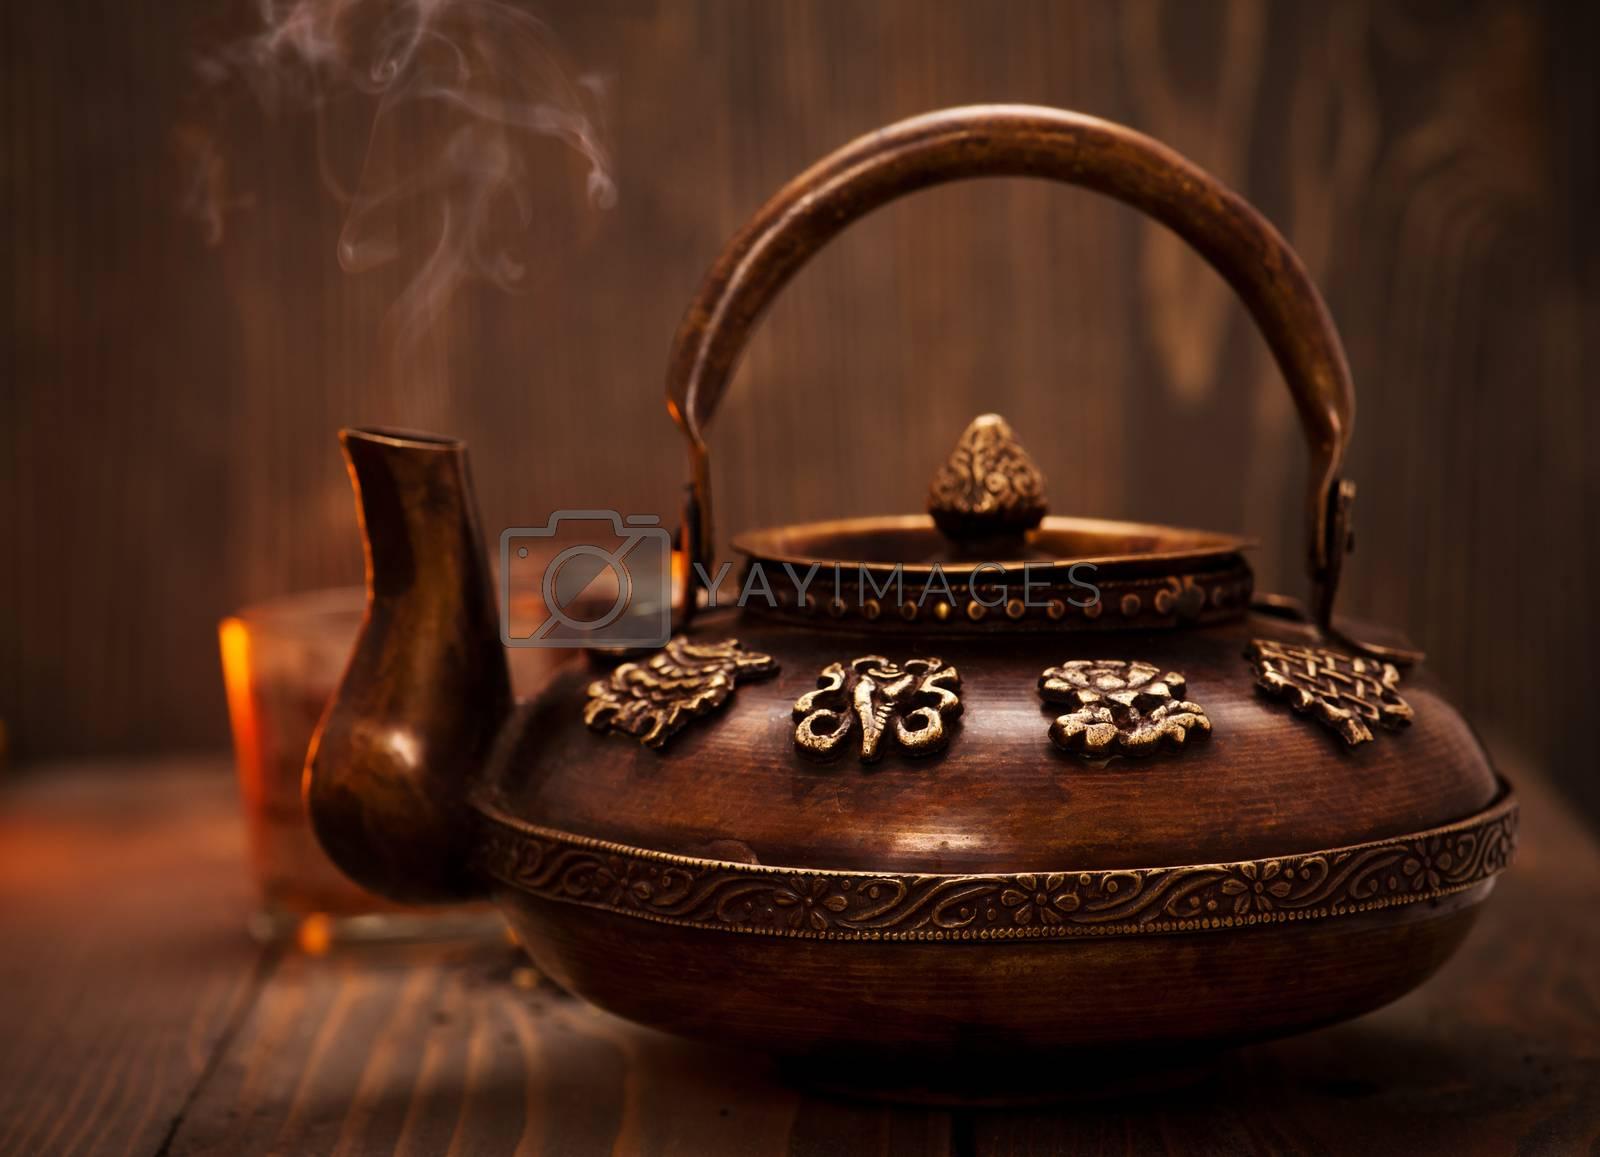 Antique iron hot tea pot fuming on dark wooden background